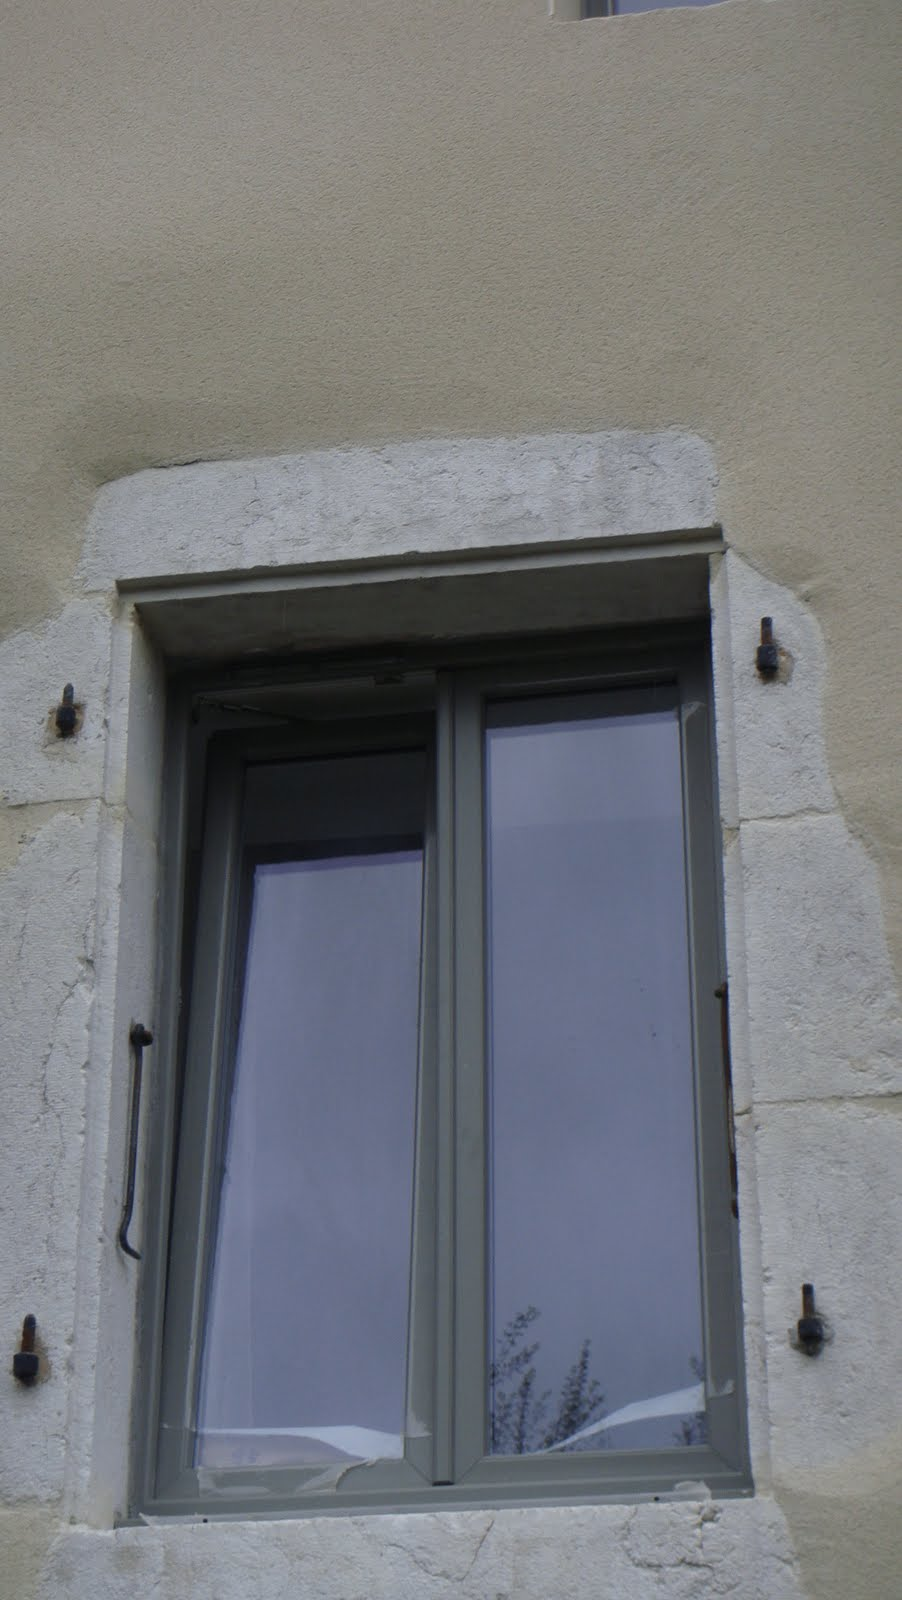 arenov menuiserie renovatin depose totale pvc laqu exterieure gris. Black Bedroom Furniture Sets. Home Design Ideas